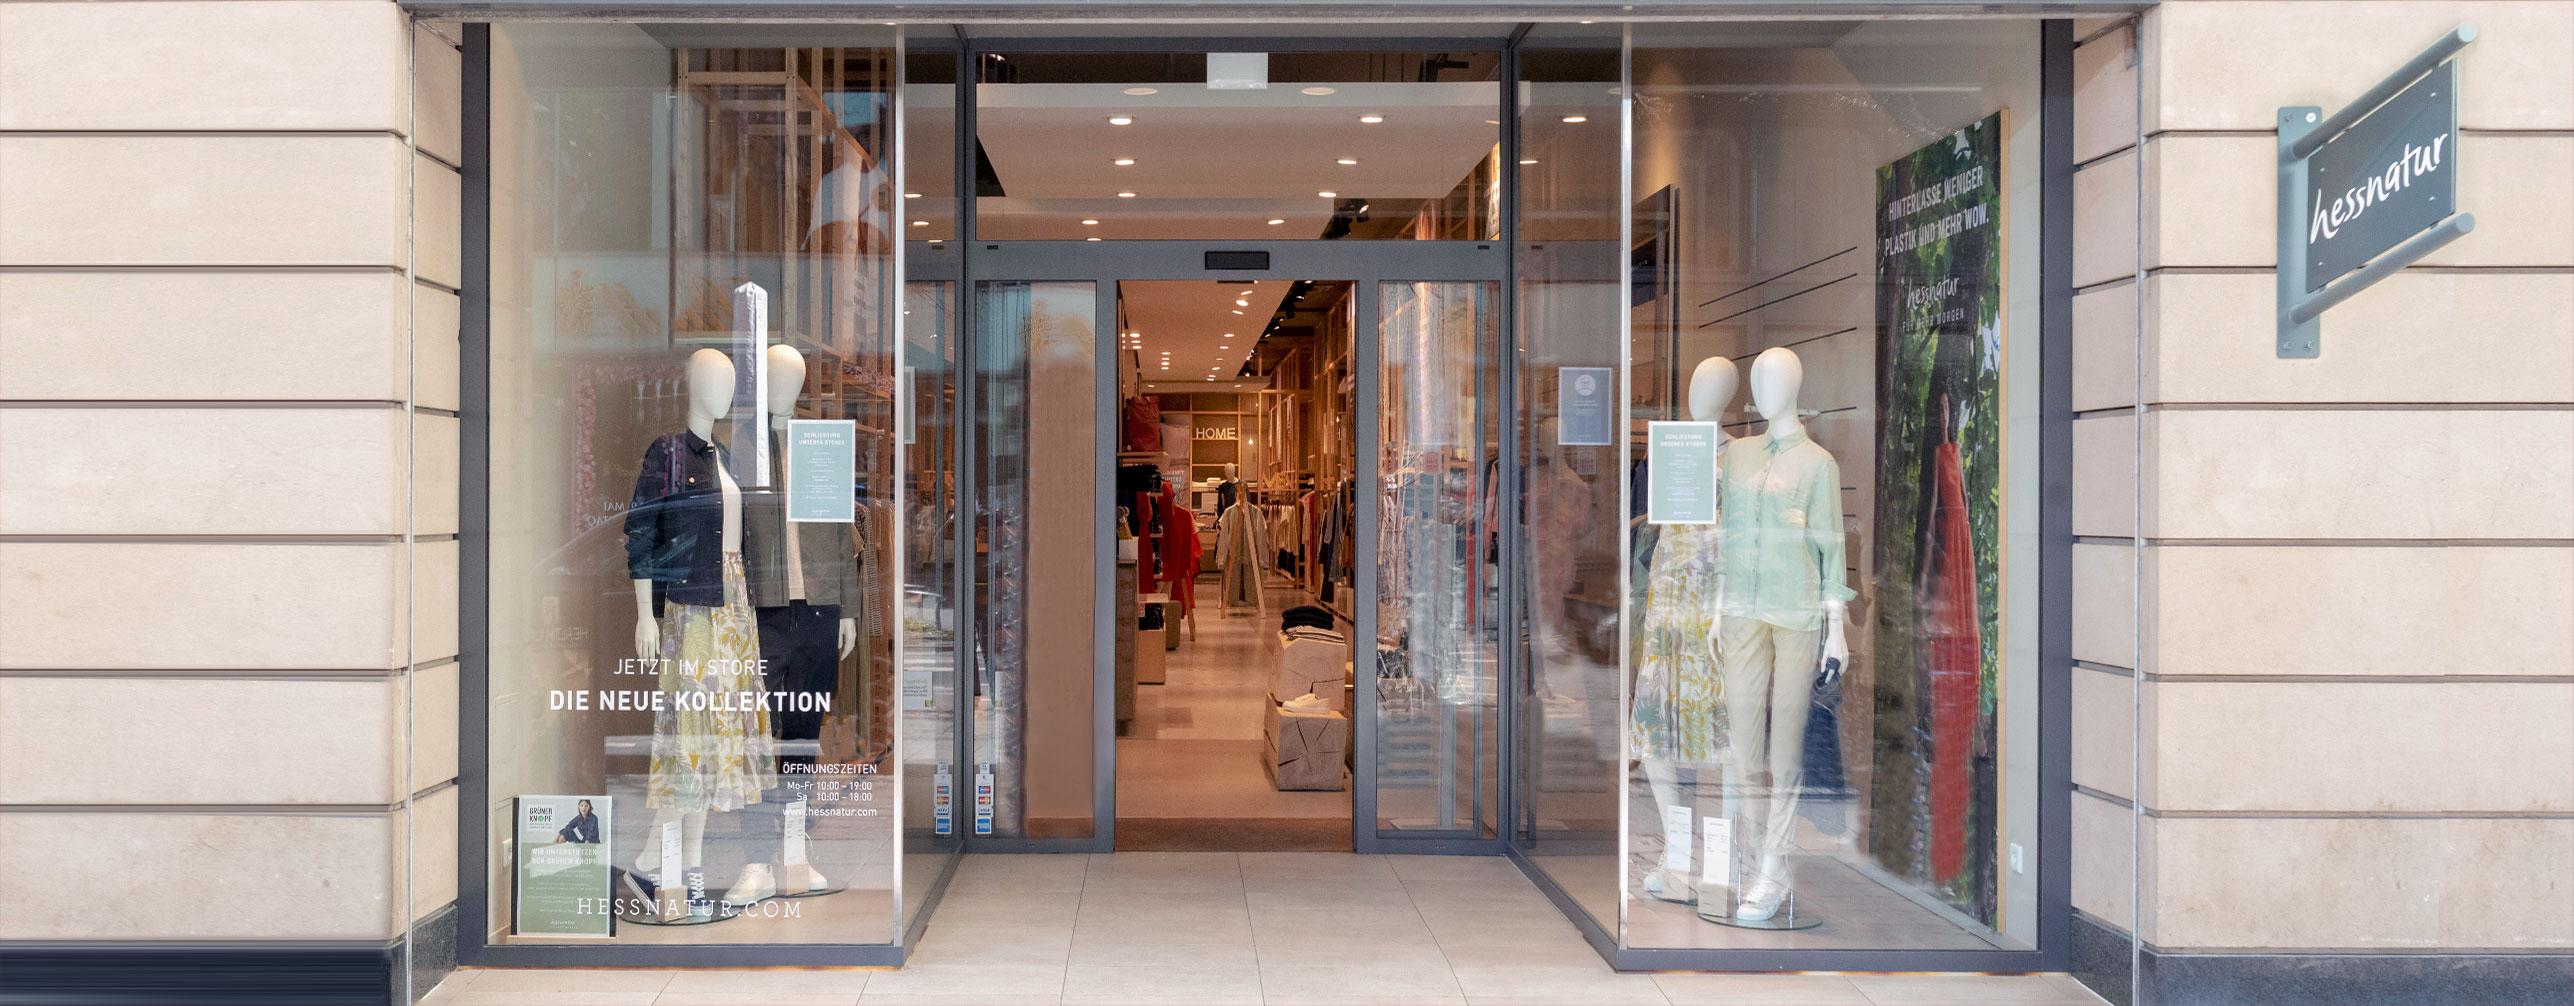 Shop Fur Faire Kleidung In Frankfurt Oko Mode In Frankfurt Kaufen Hessnatur Deutschland